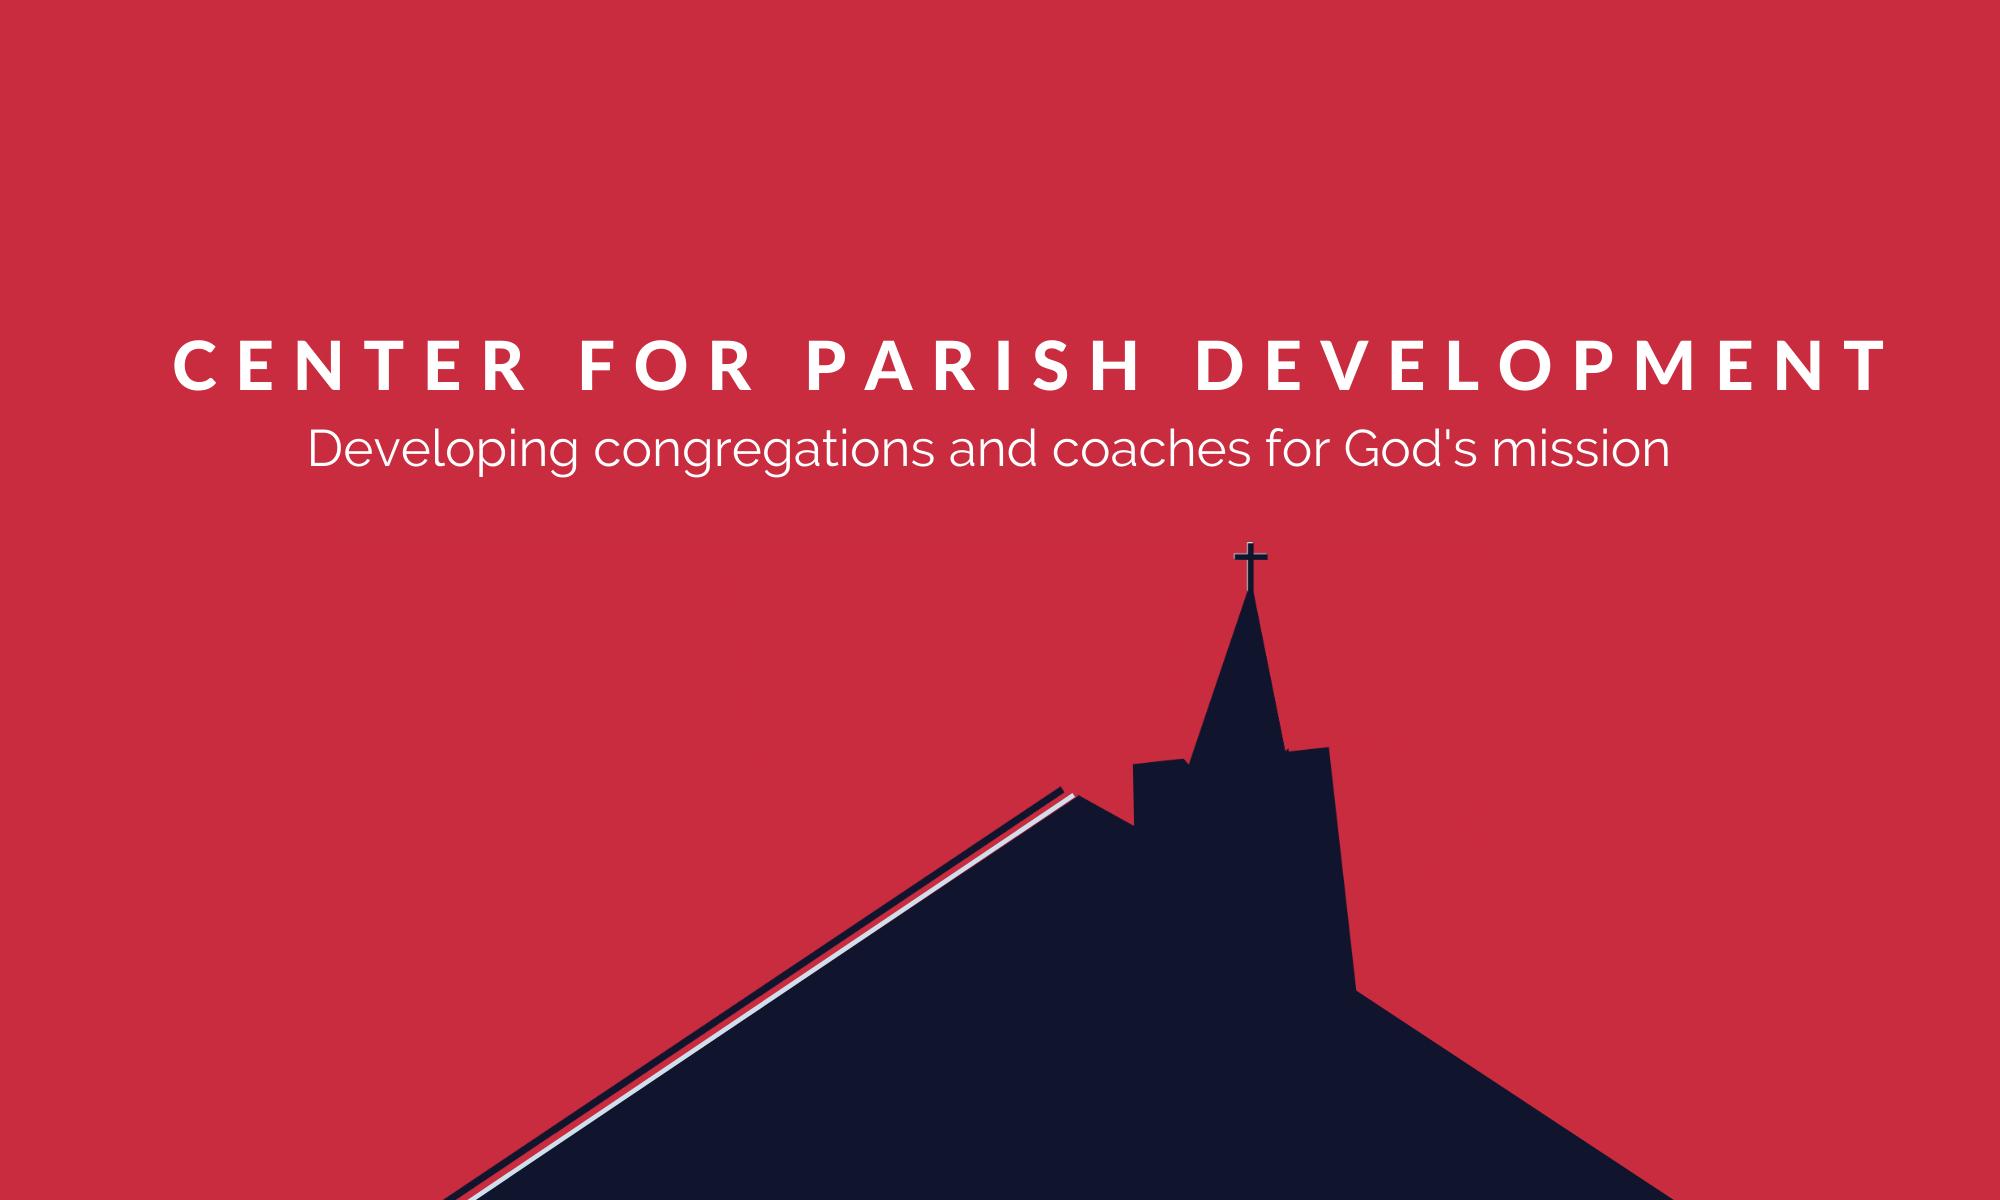 Center for Parish Development